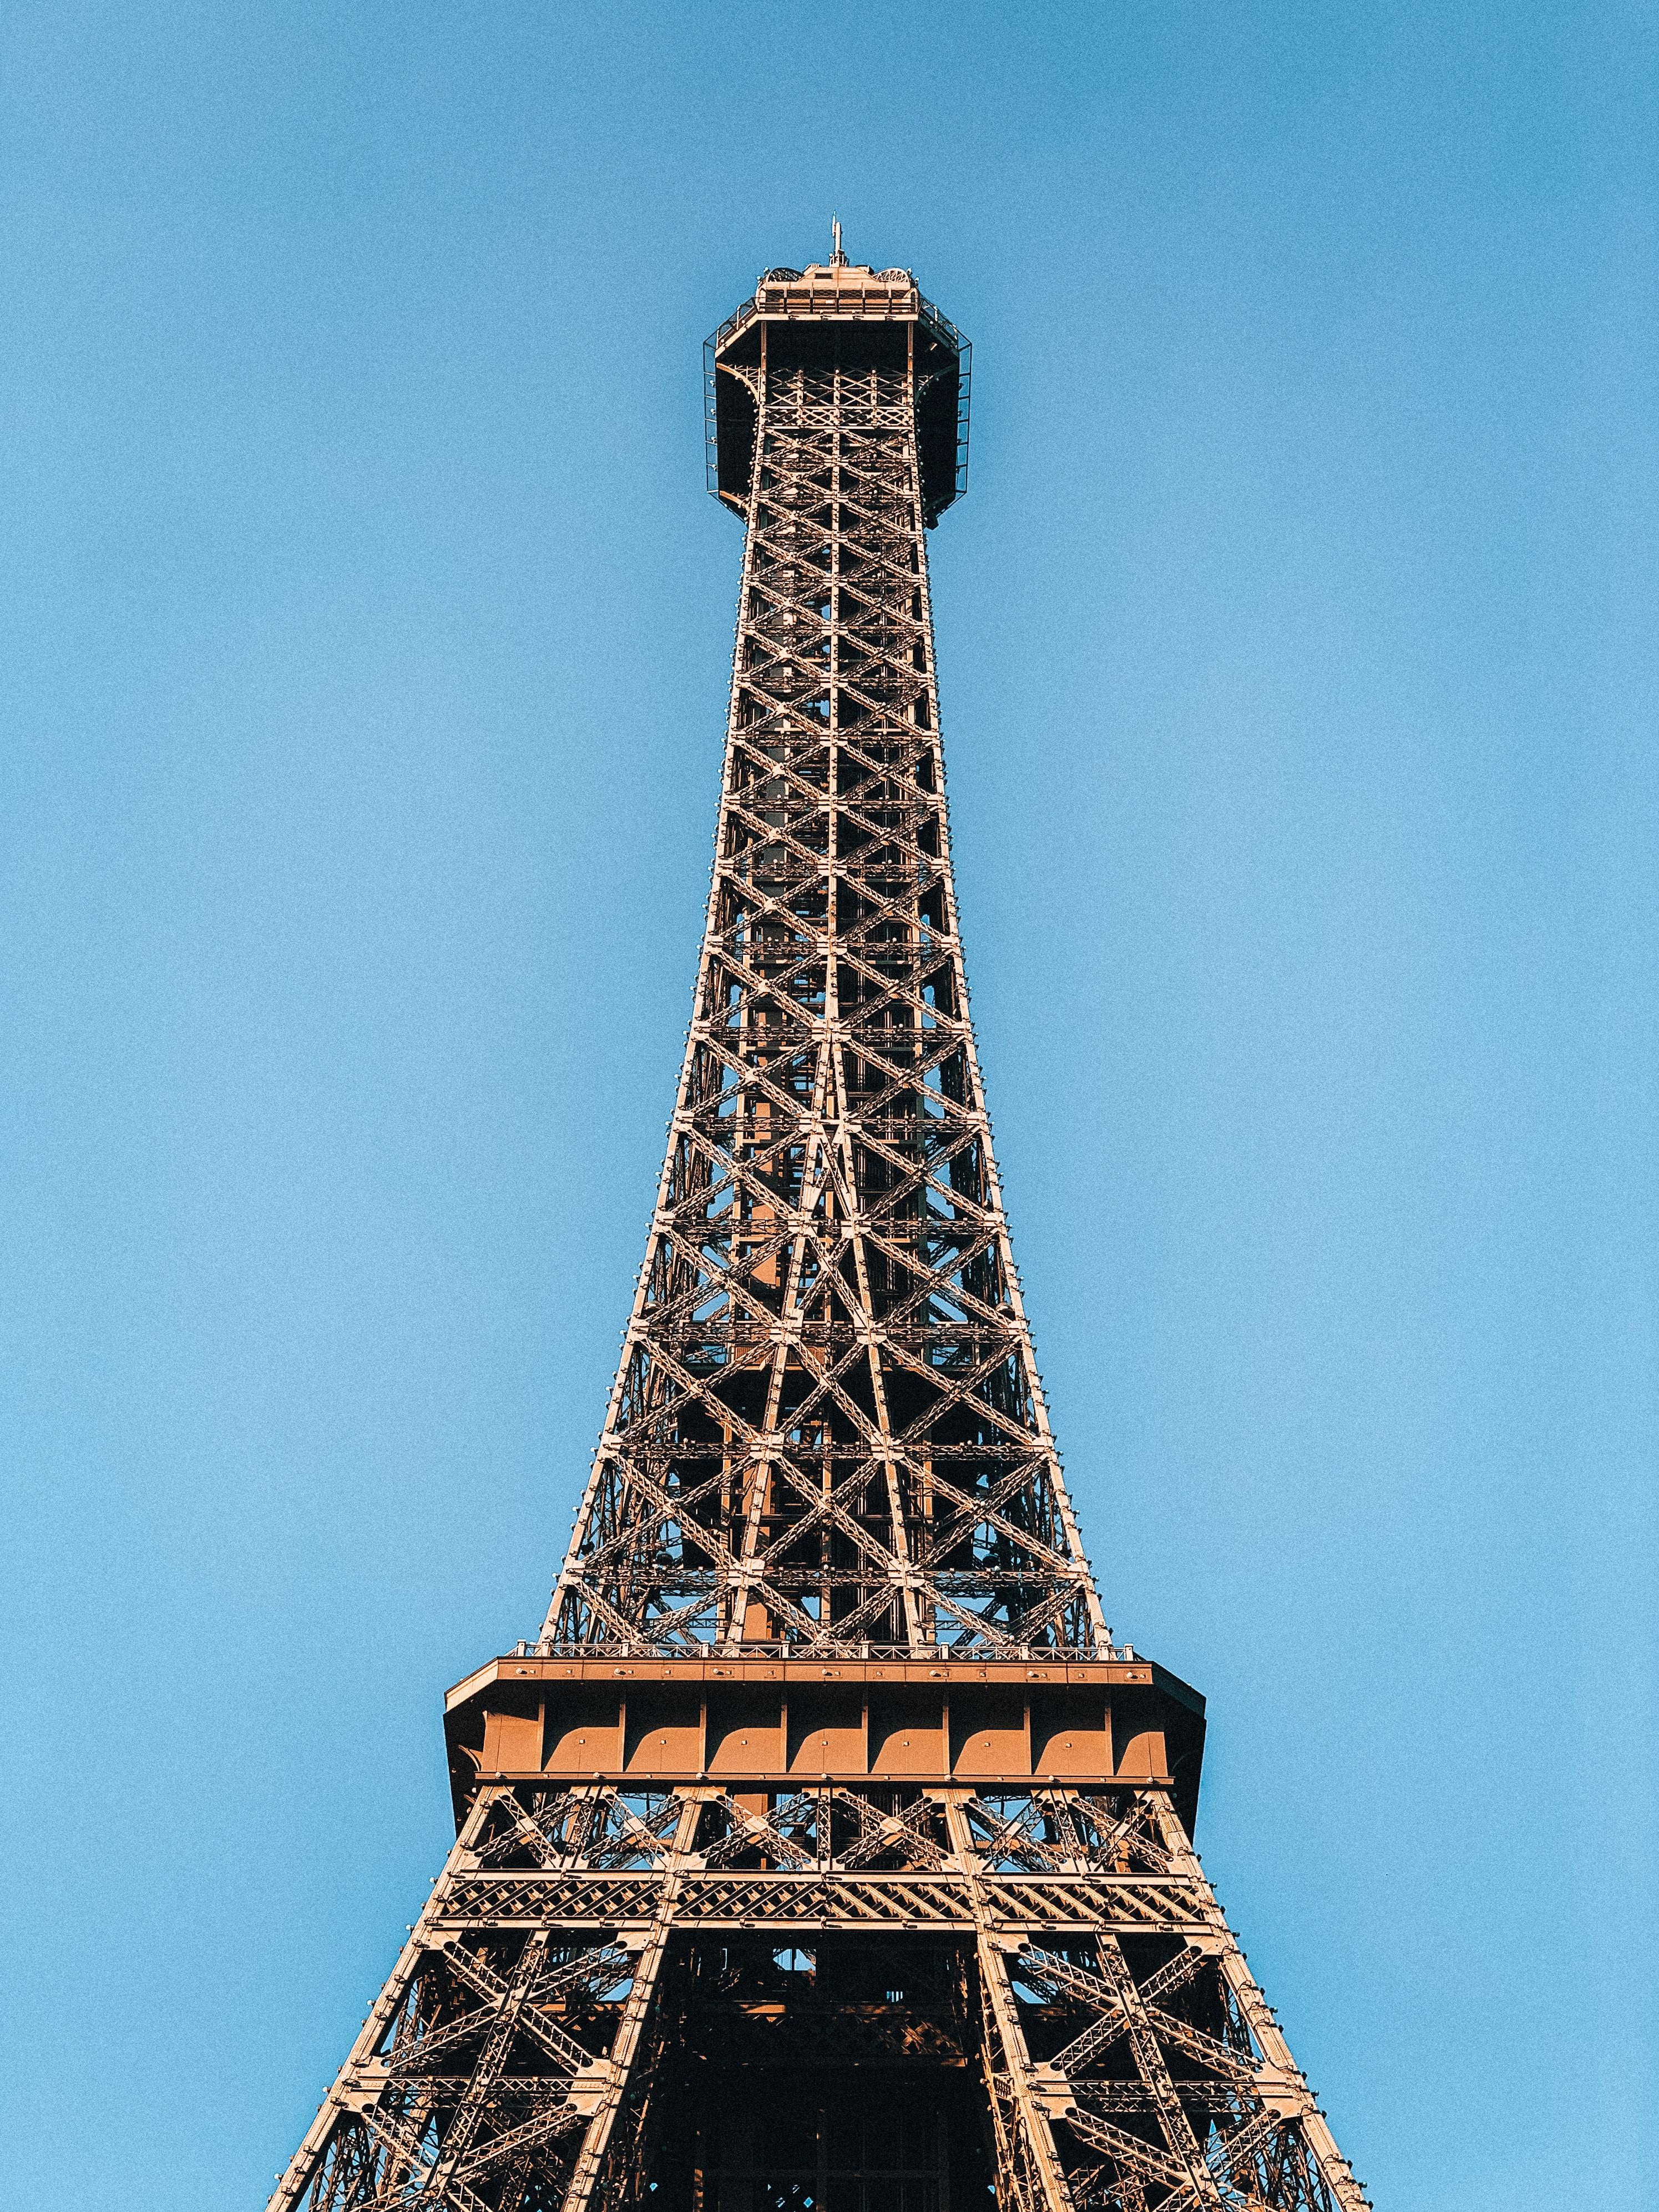 Eiffel Tower at The Parisian, Macao